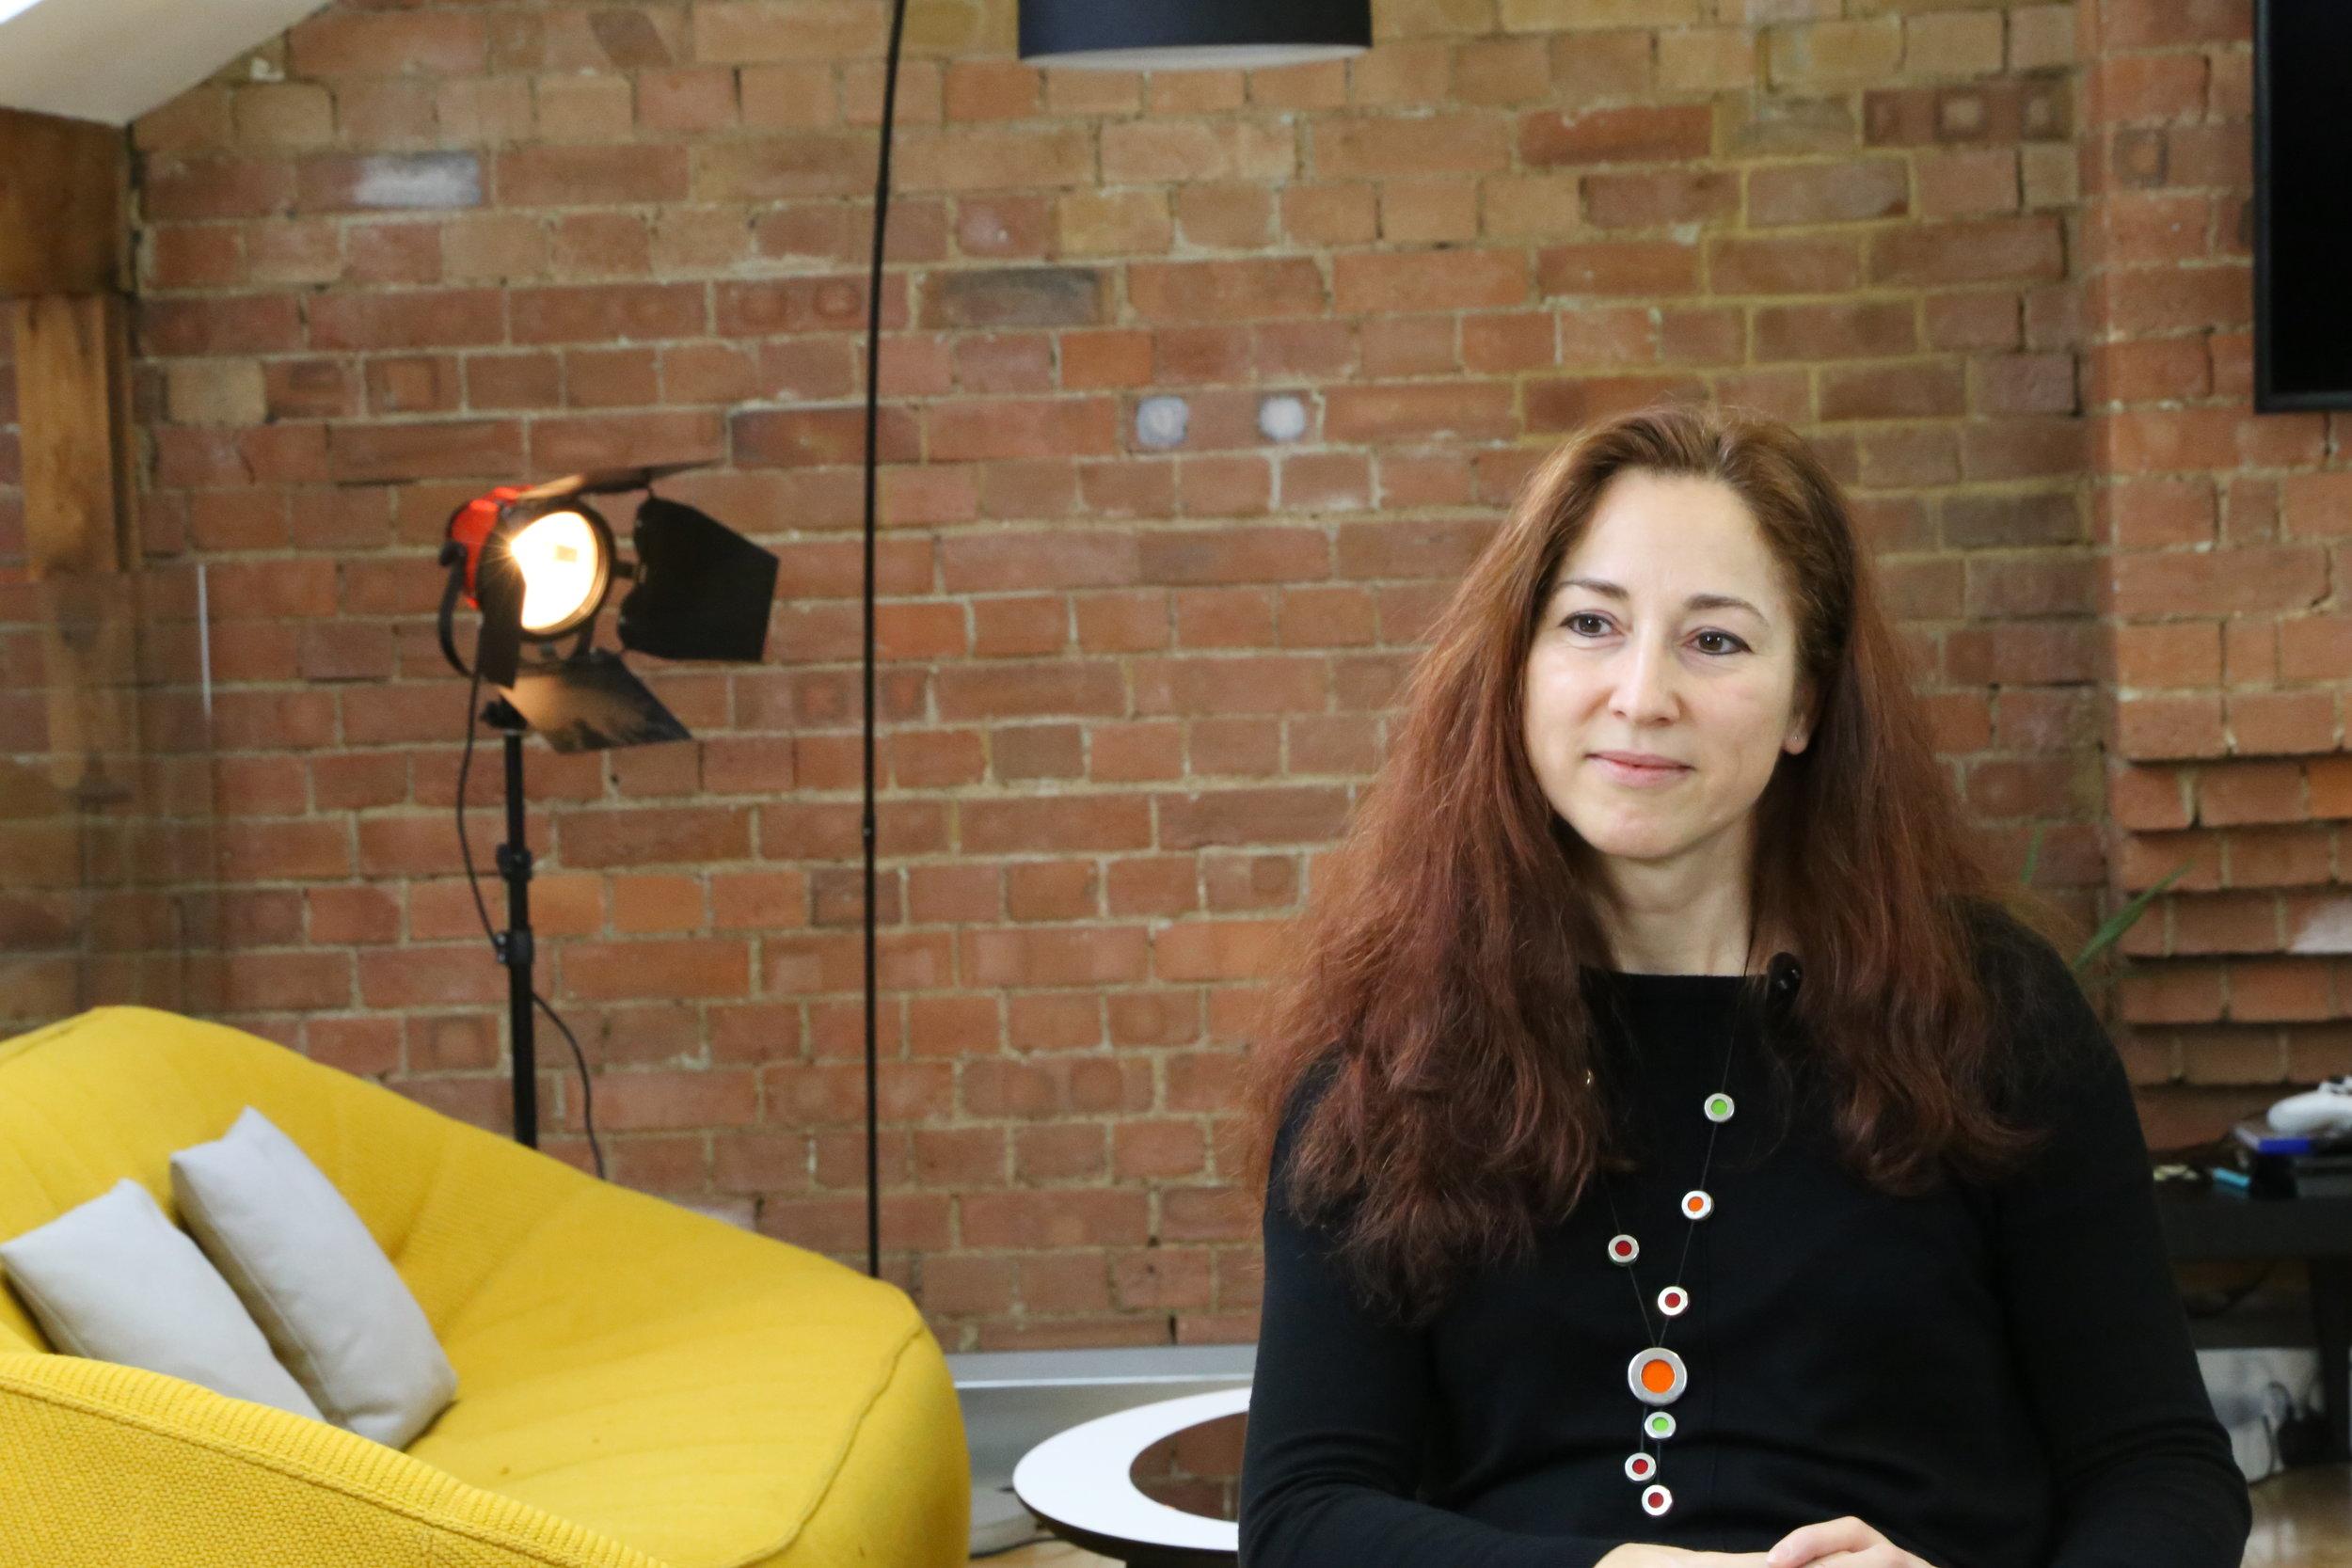 Carin Campanario - Head of UX / UI Design at GripAbleFormally Technology Innovation Strategist at TUI